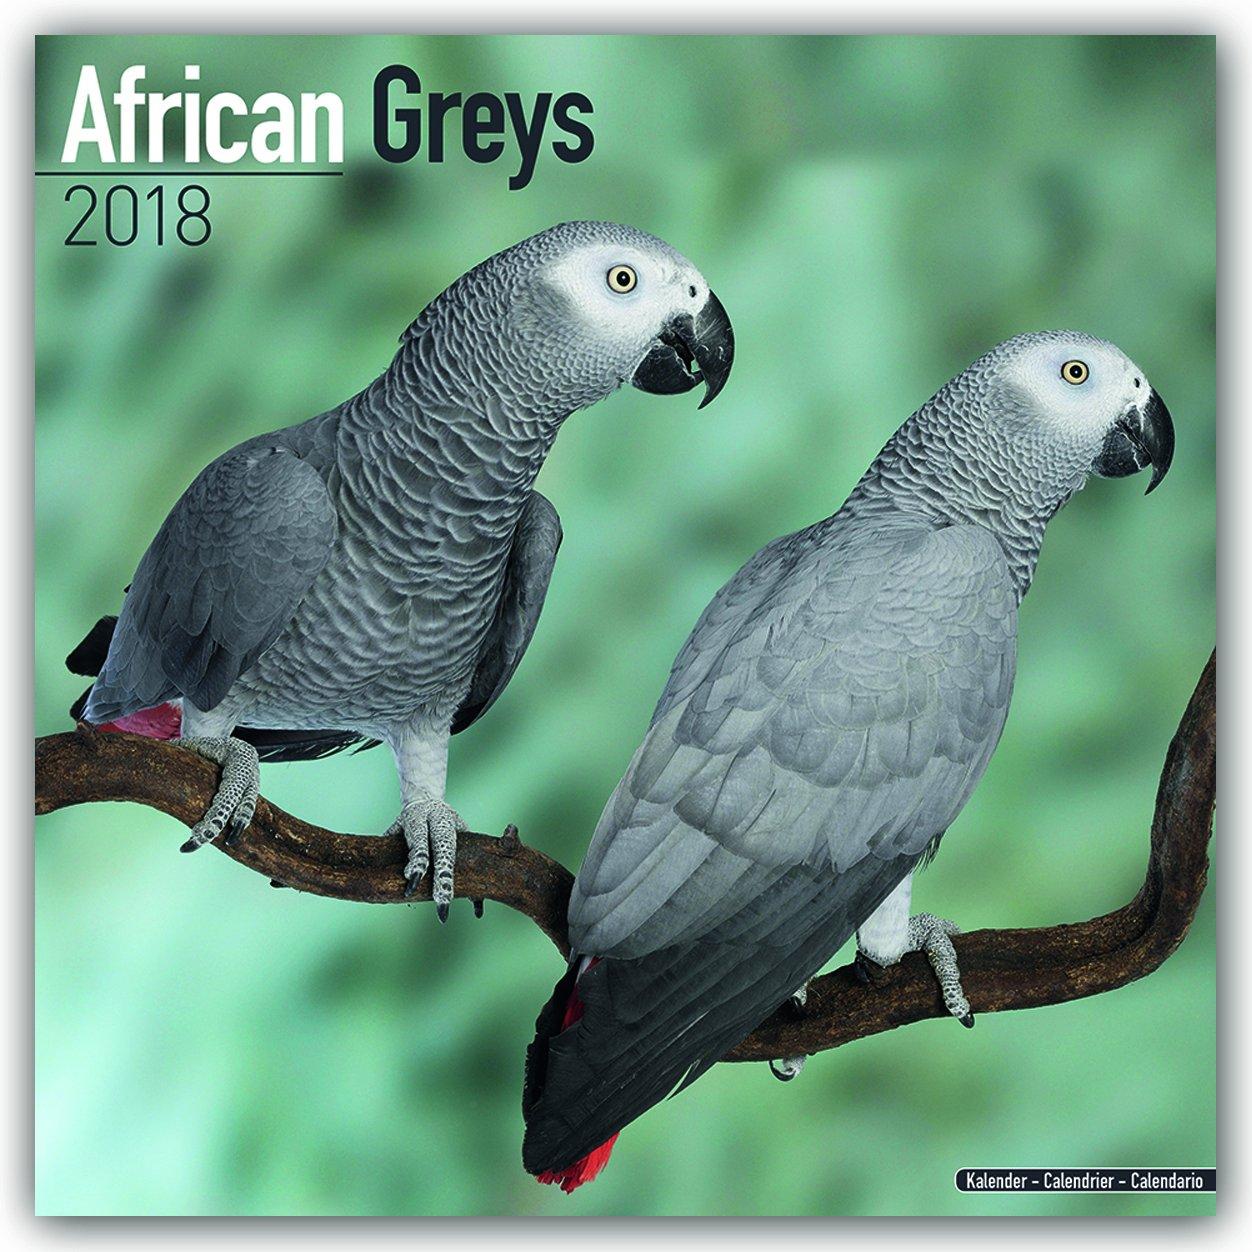 African Greys - Graupapageien 2018: Original Avonside-Kalender [Mehrsprachig] [Kalender] (Wall-Kalender)